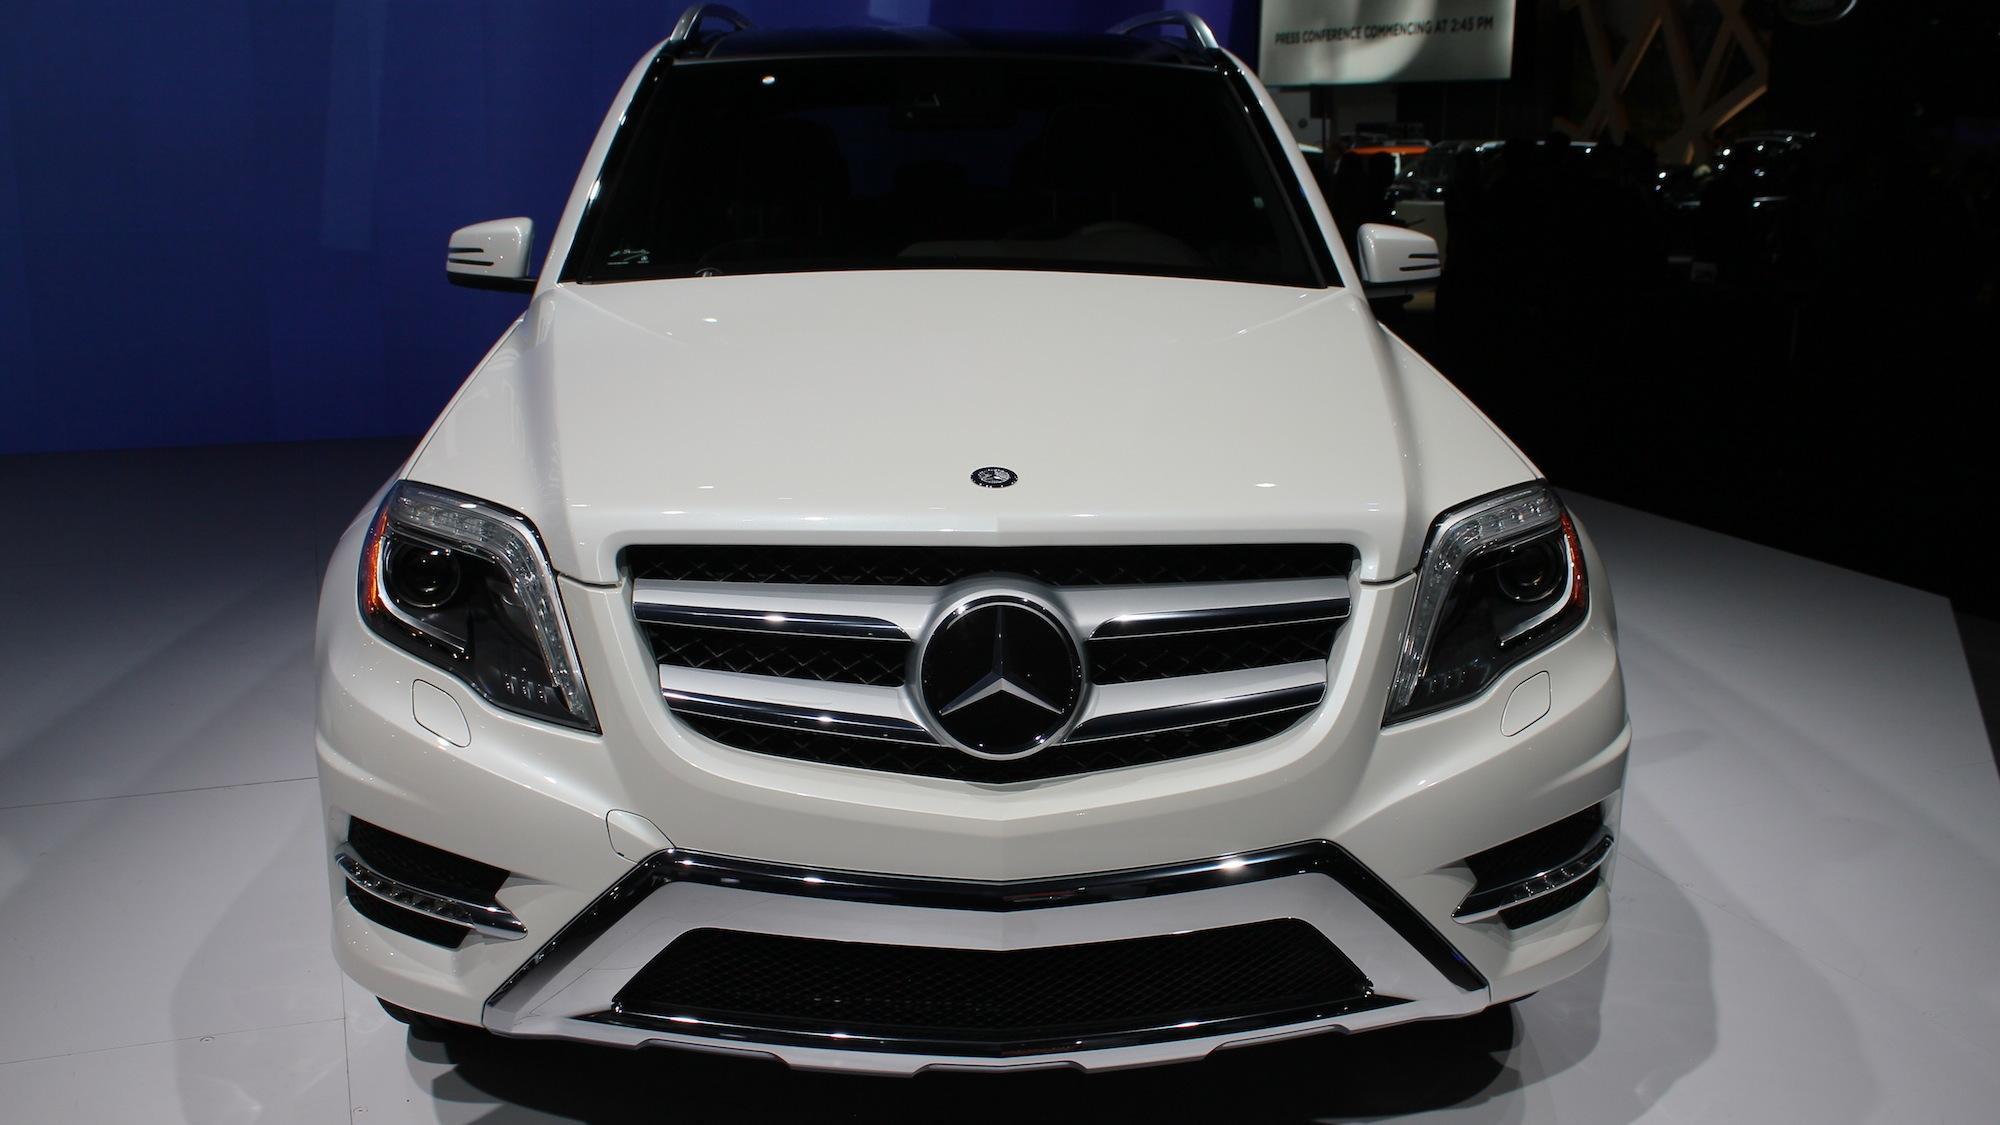 2013 Mercedes-Benz GLK Class, 2012 New York Auto Show